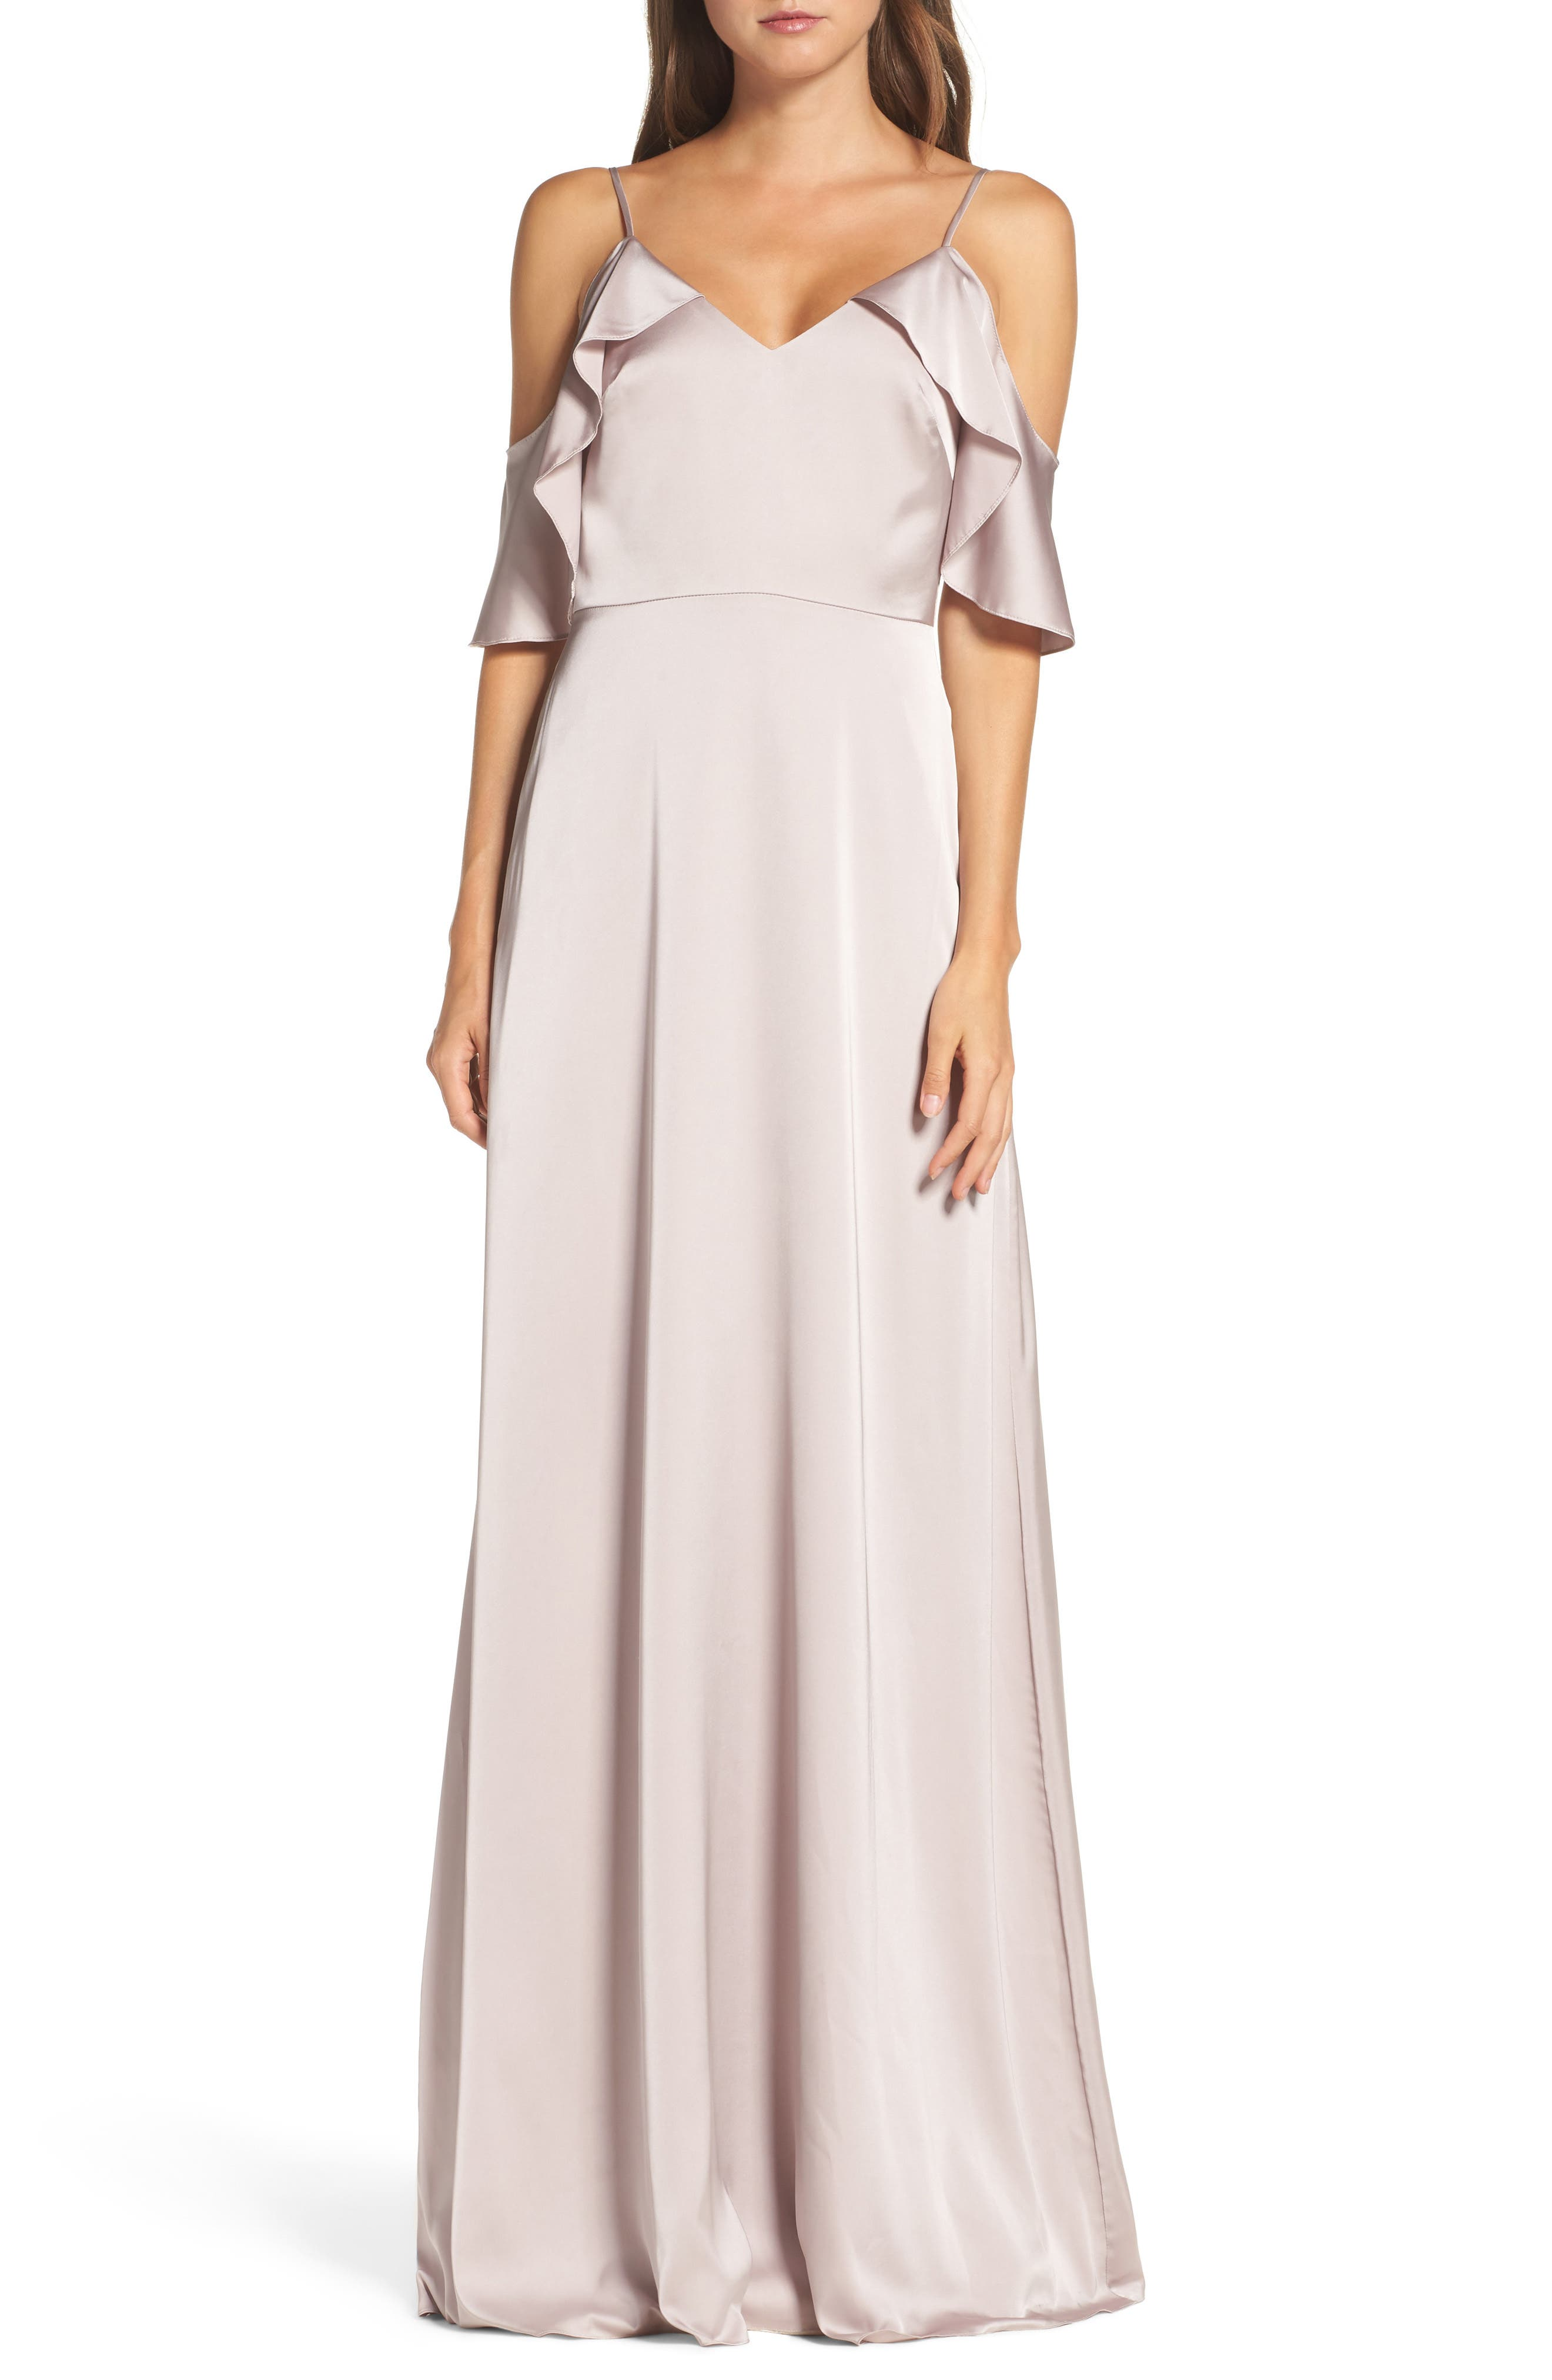 Alternate Image 1 Selected - Monique Lhuillier Bridesmaids Isabel Sateen Cold Shoulder Gown